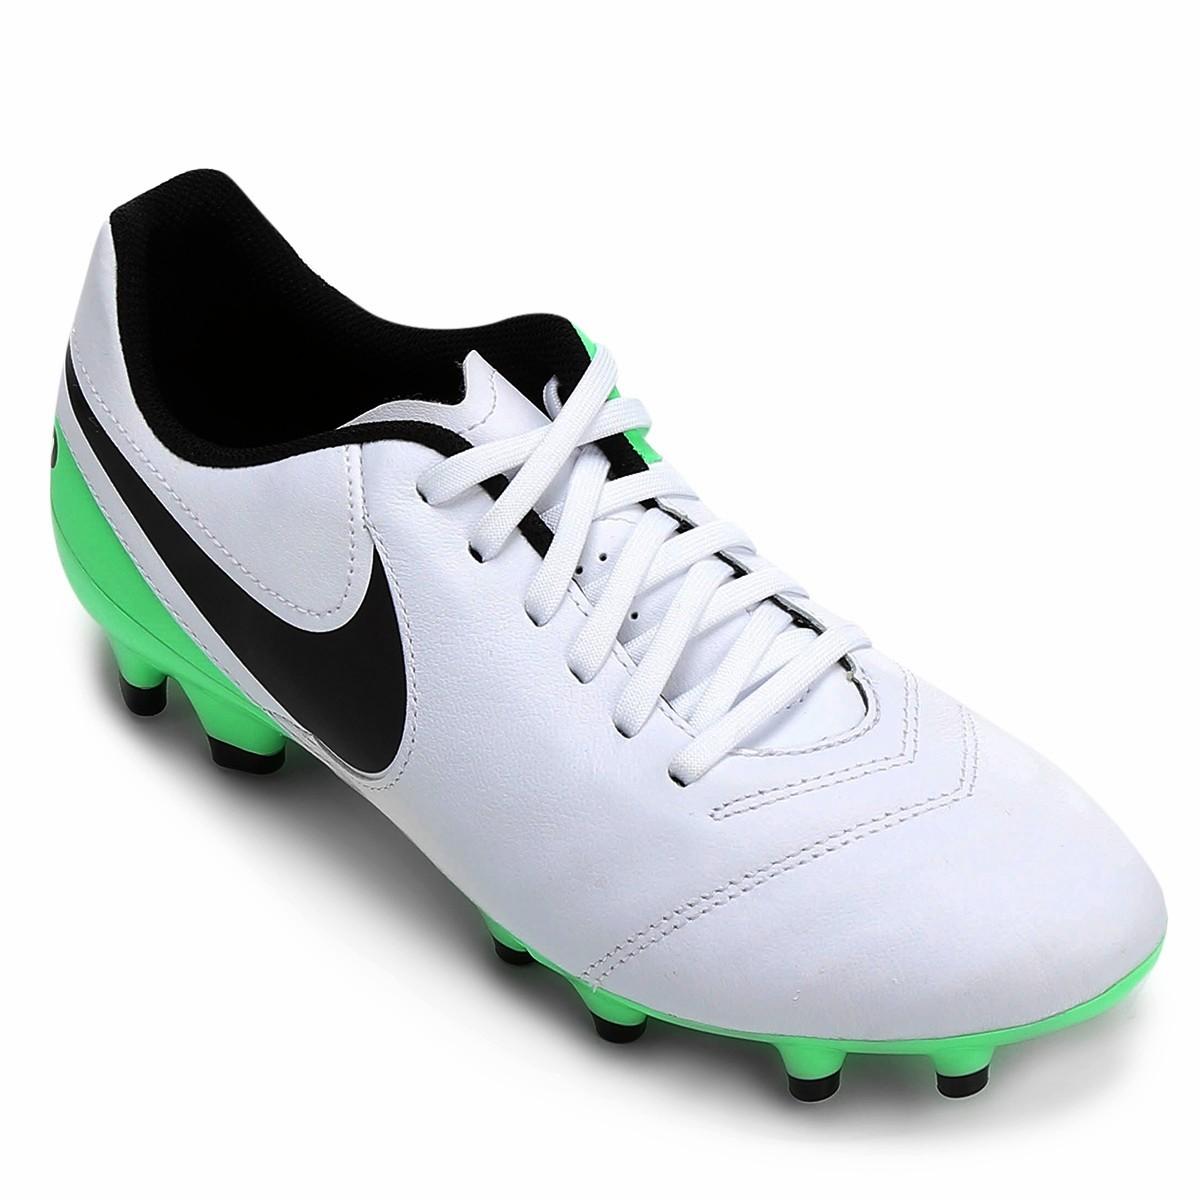 Chuteira Nike Tiempo Genio II Leather FG 819213-103 Branco Verde 1a893c9bf6840